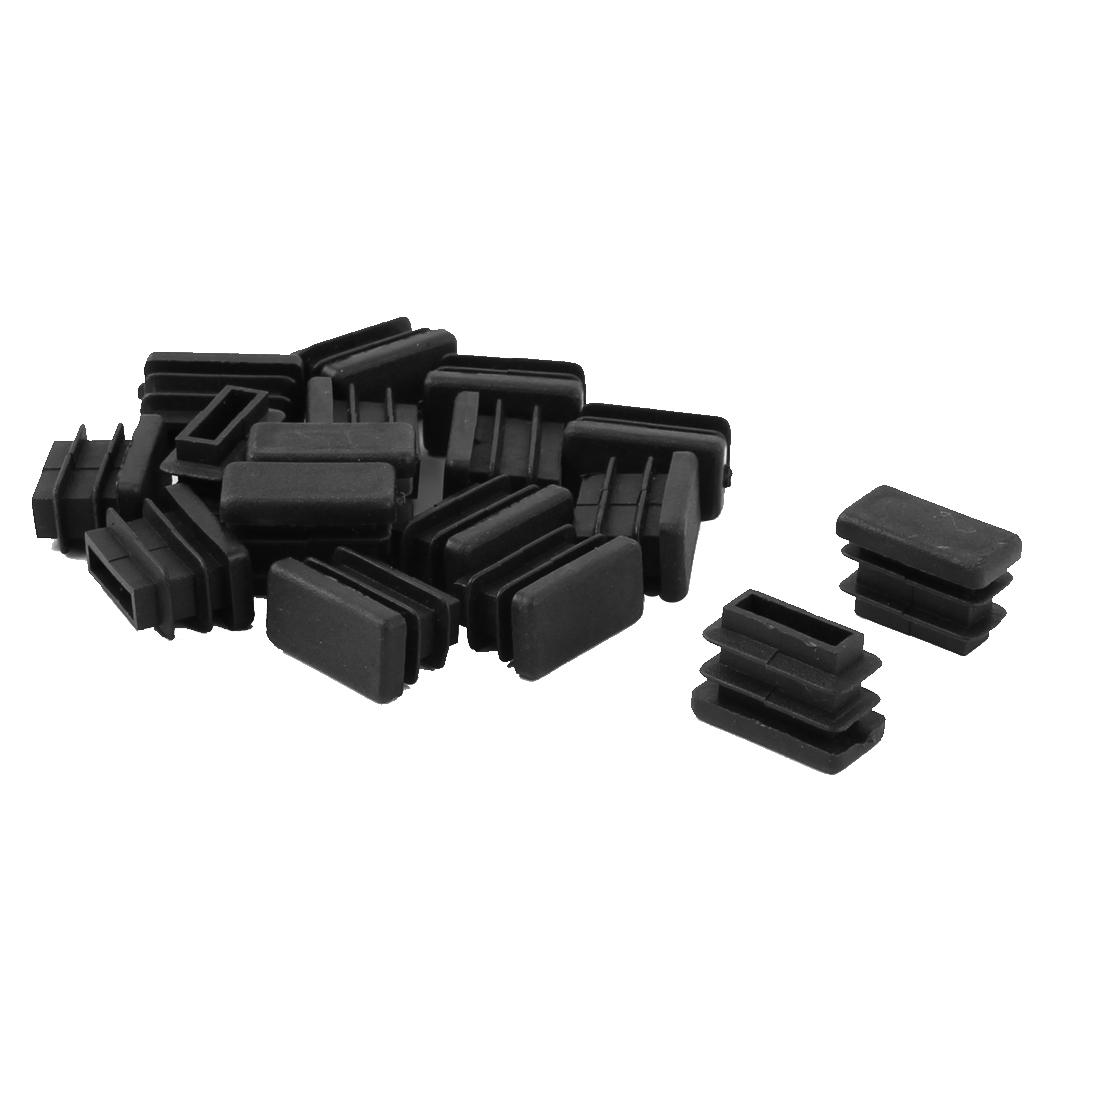 Plastic Rectangle Tube Inserts Furniture Glides End Blanking Caps Black 16pcs